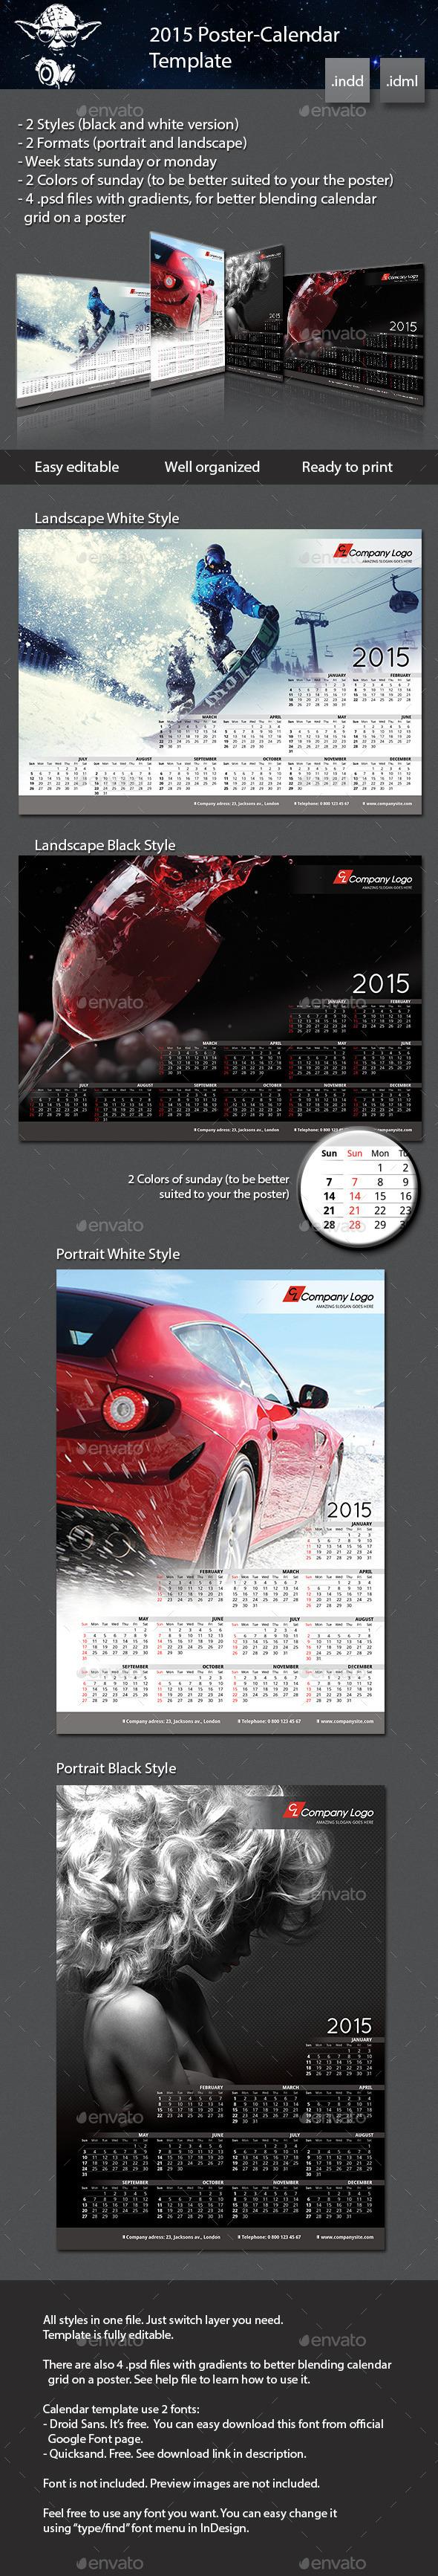 GraphicRiver 2015 Poster-Calendar template 8871563